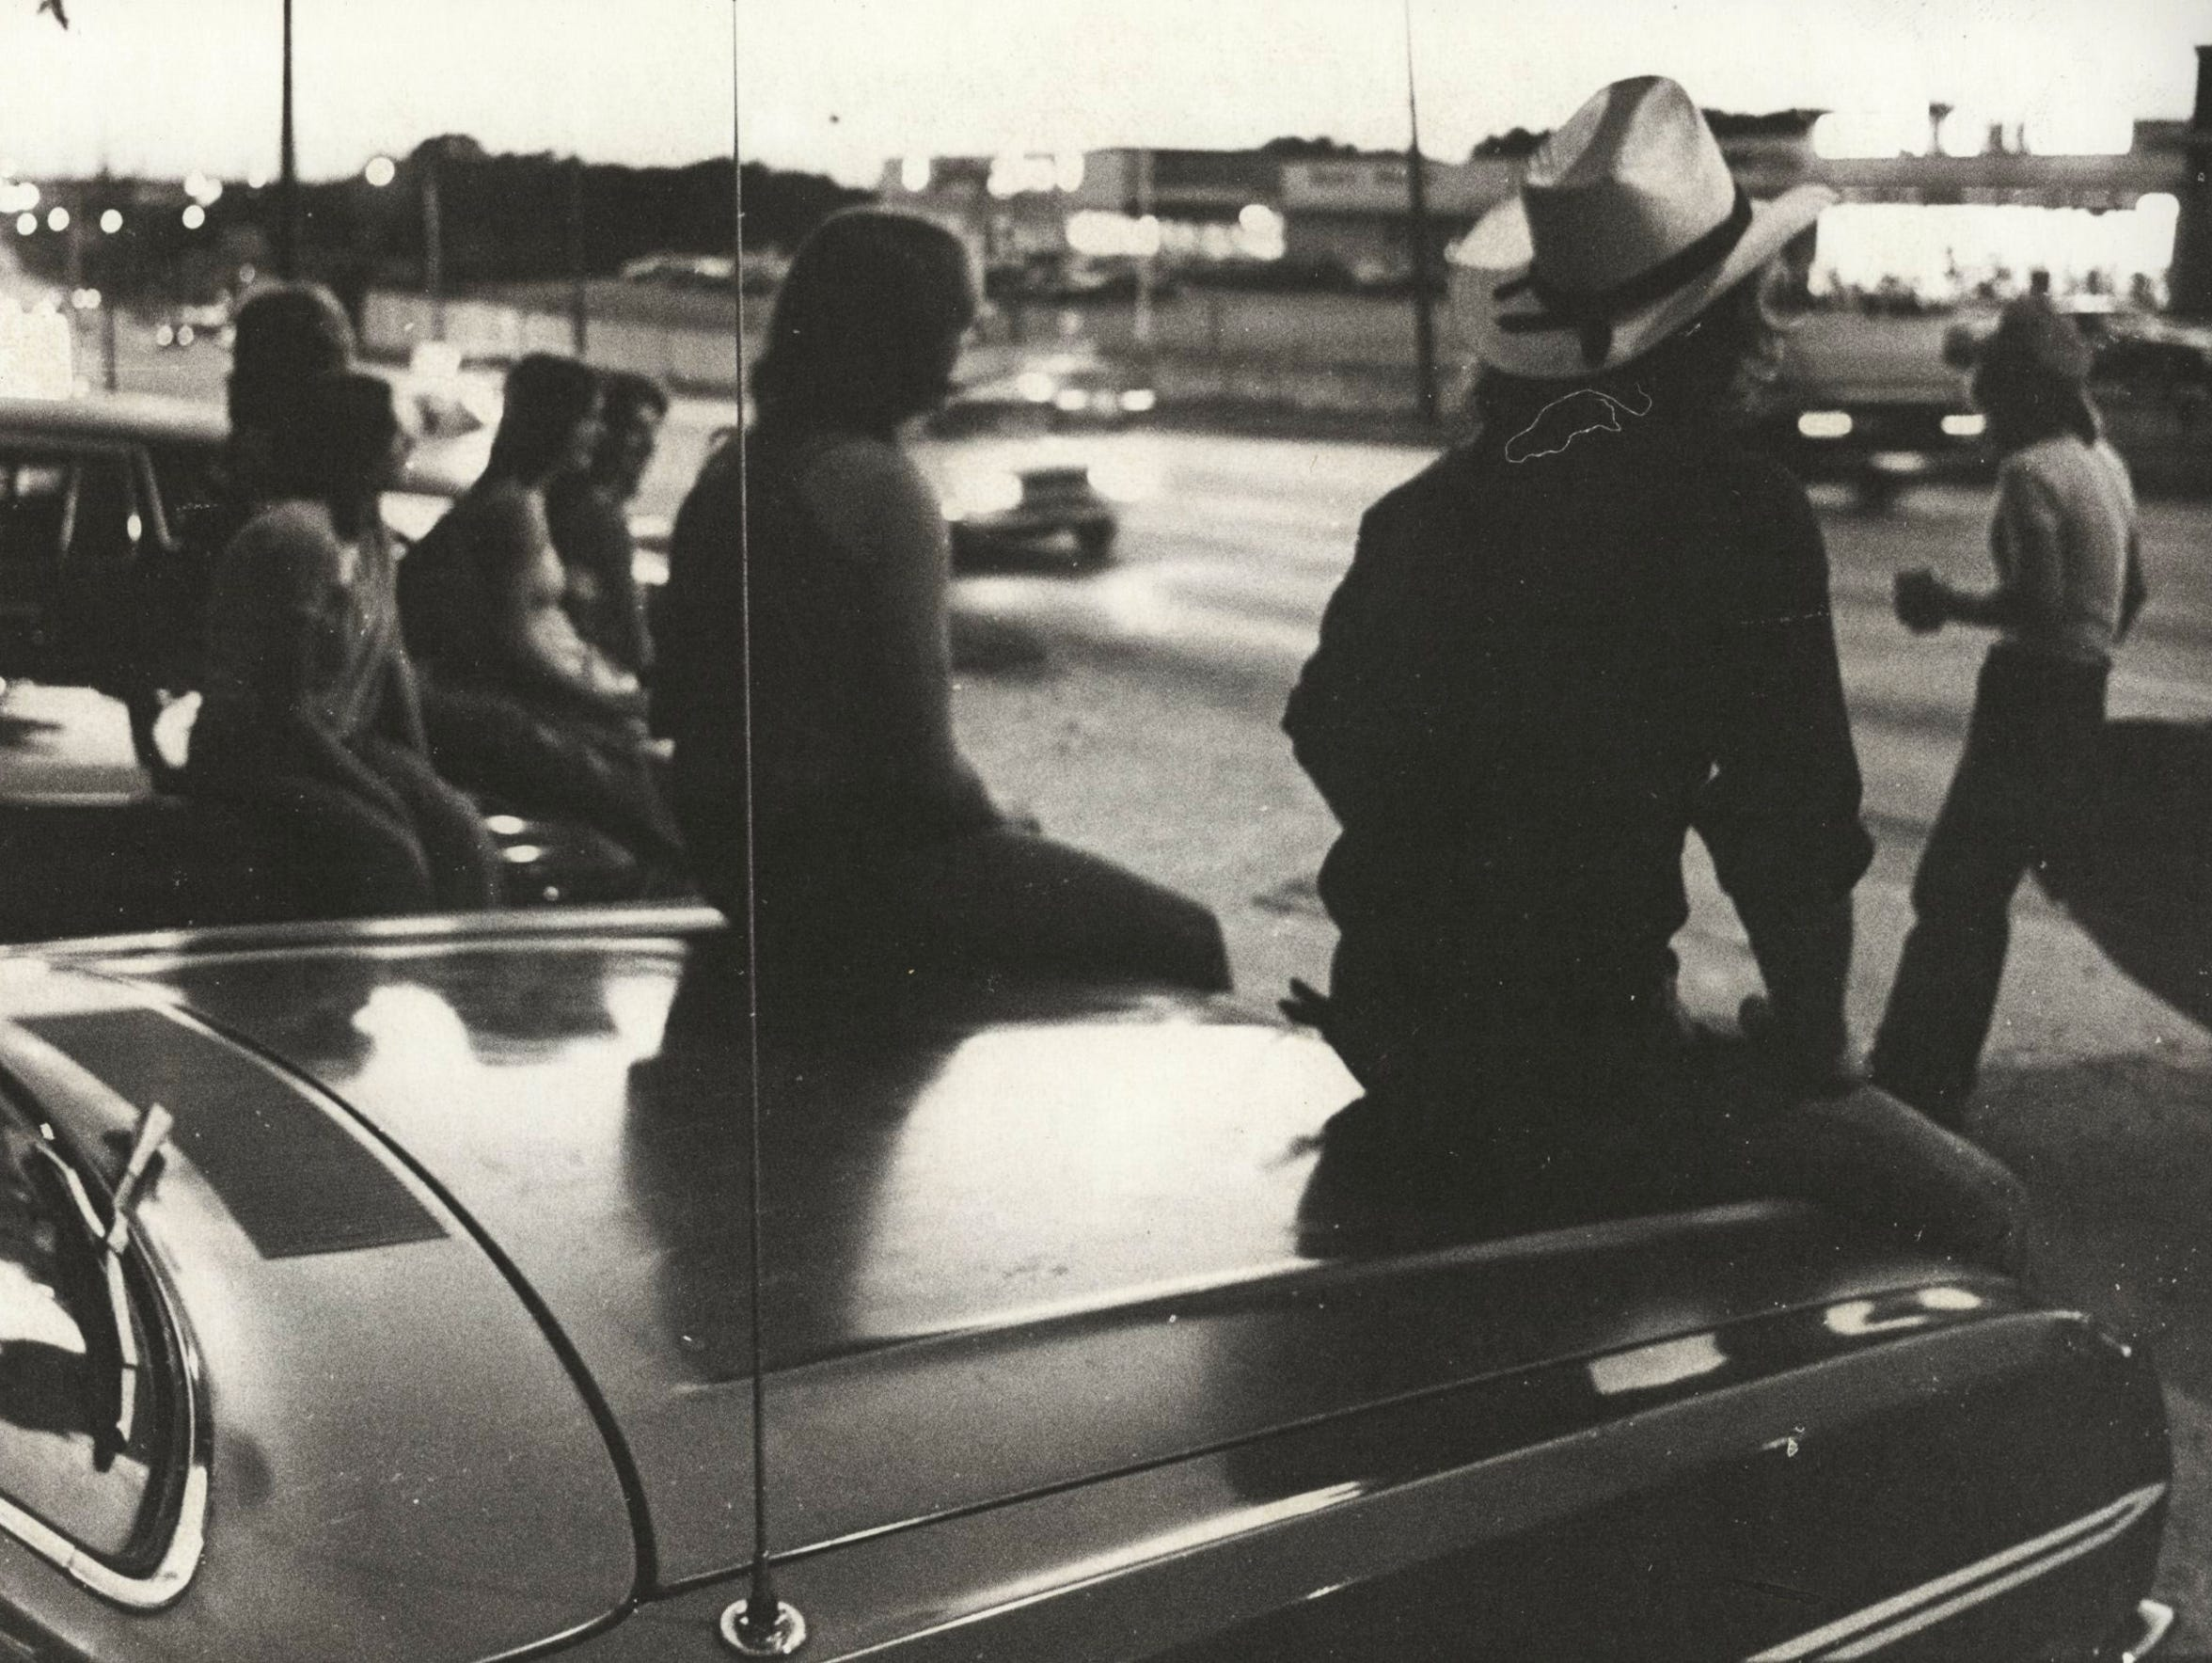 Cruising on Kearney Street on August 1, 1979.